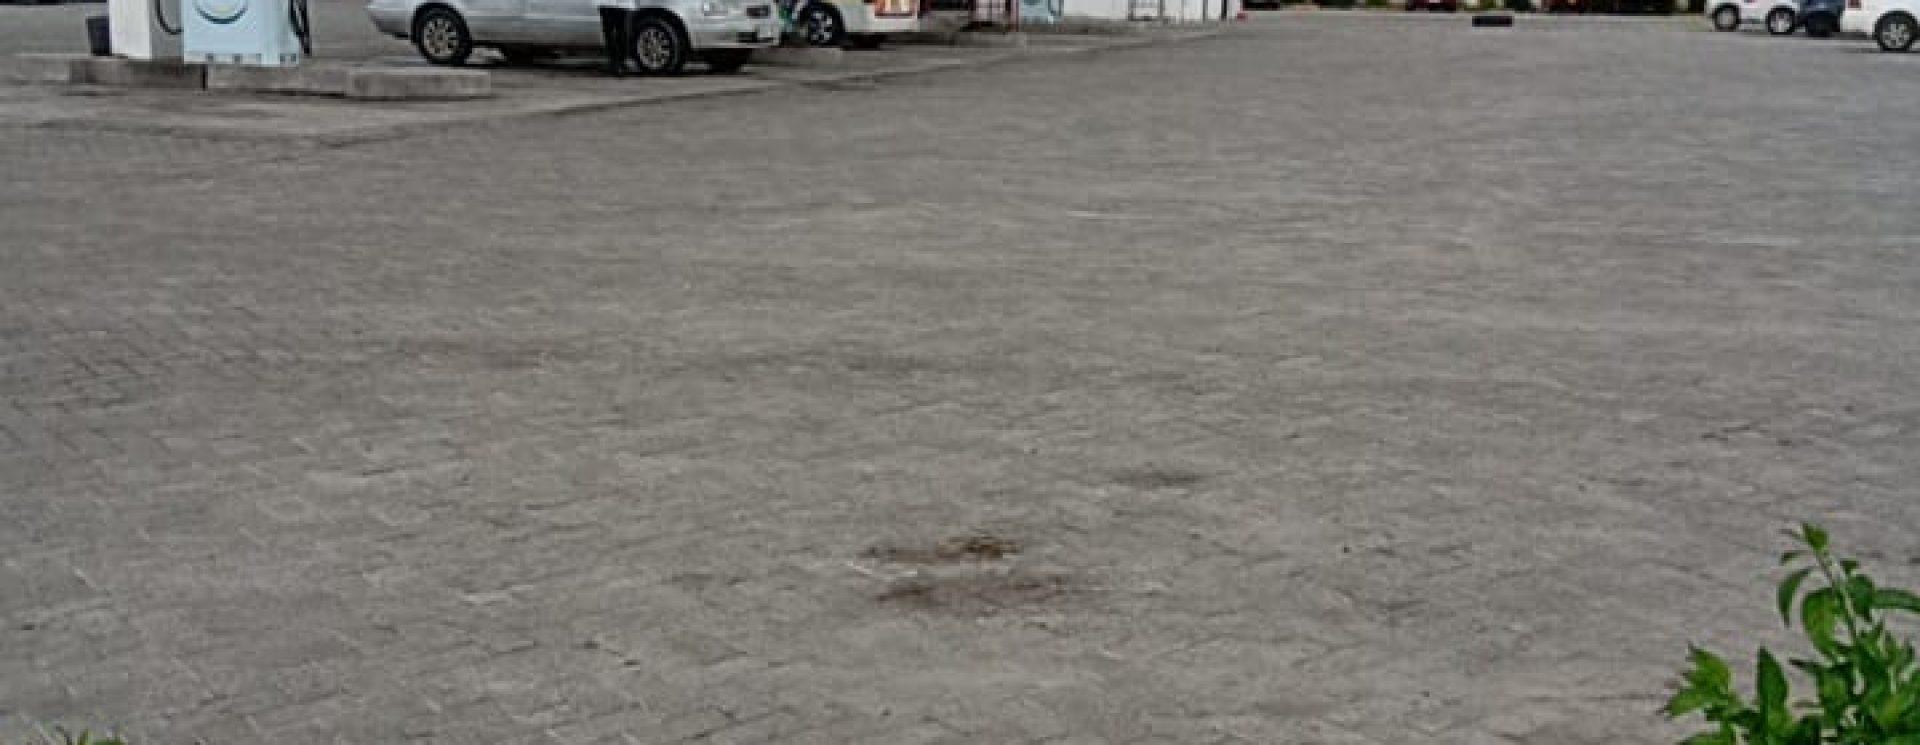 PETROL STATION FOR SALE IN KITENGELA